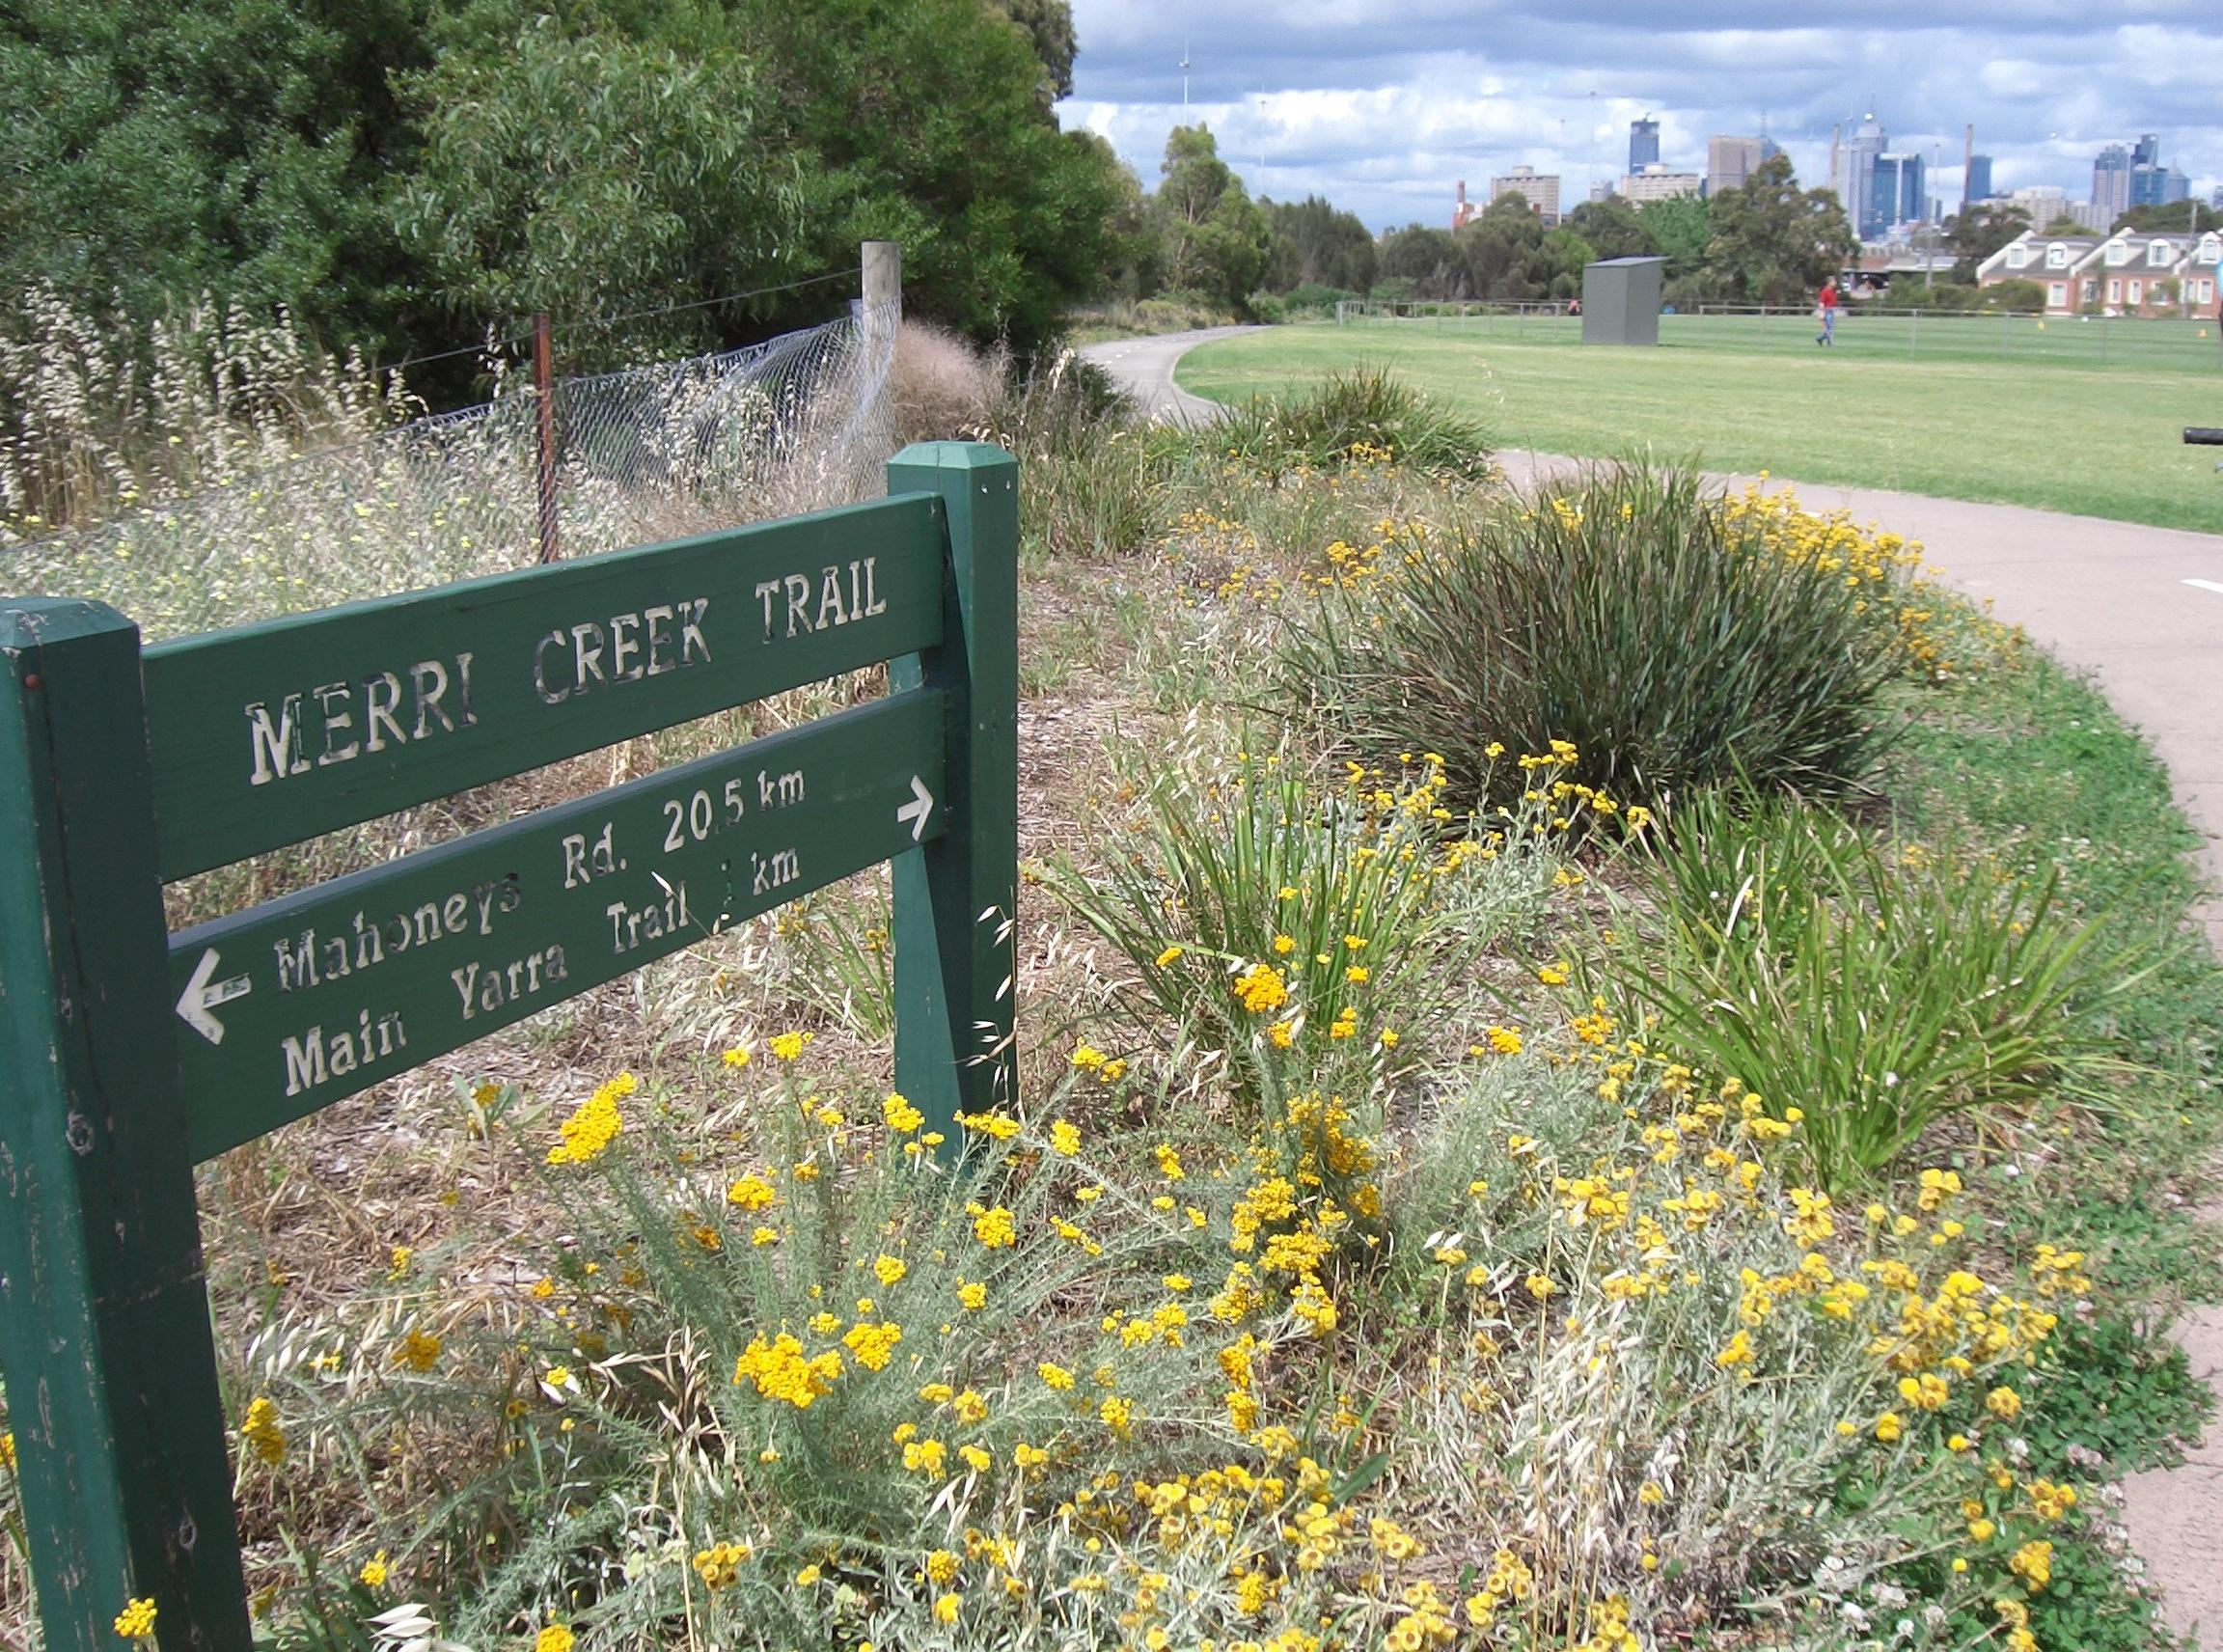 file merri creek trail sign and path jpg wikimedia commons. Black Bedroom Furniture Sets. Home Design Ideas